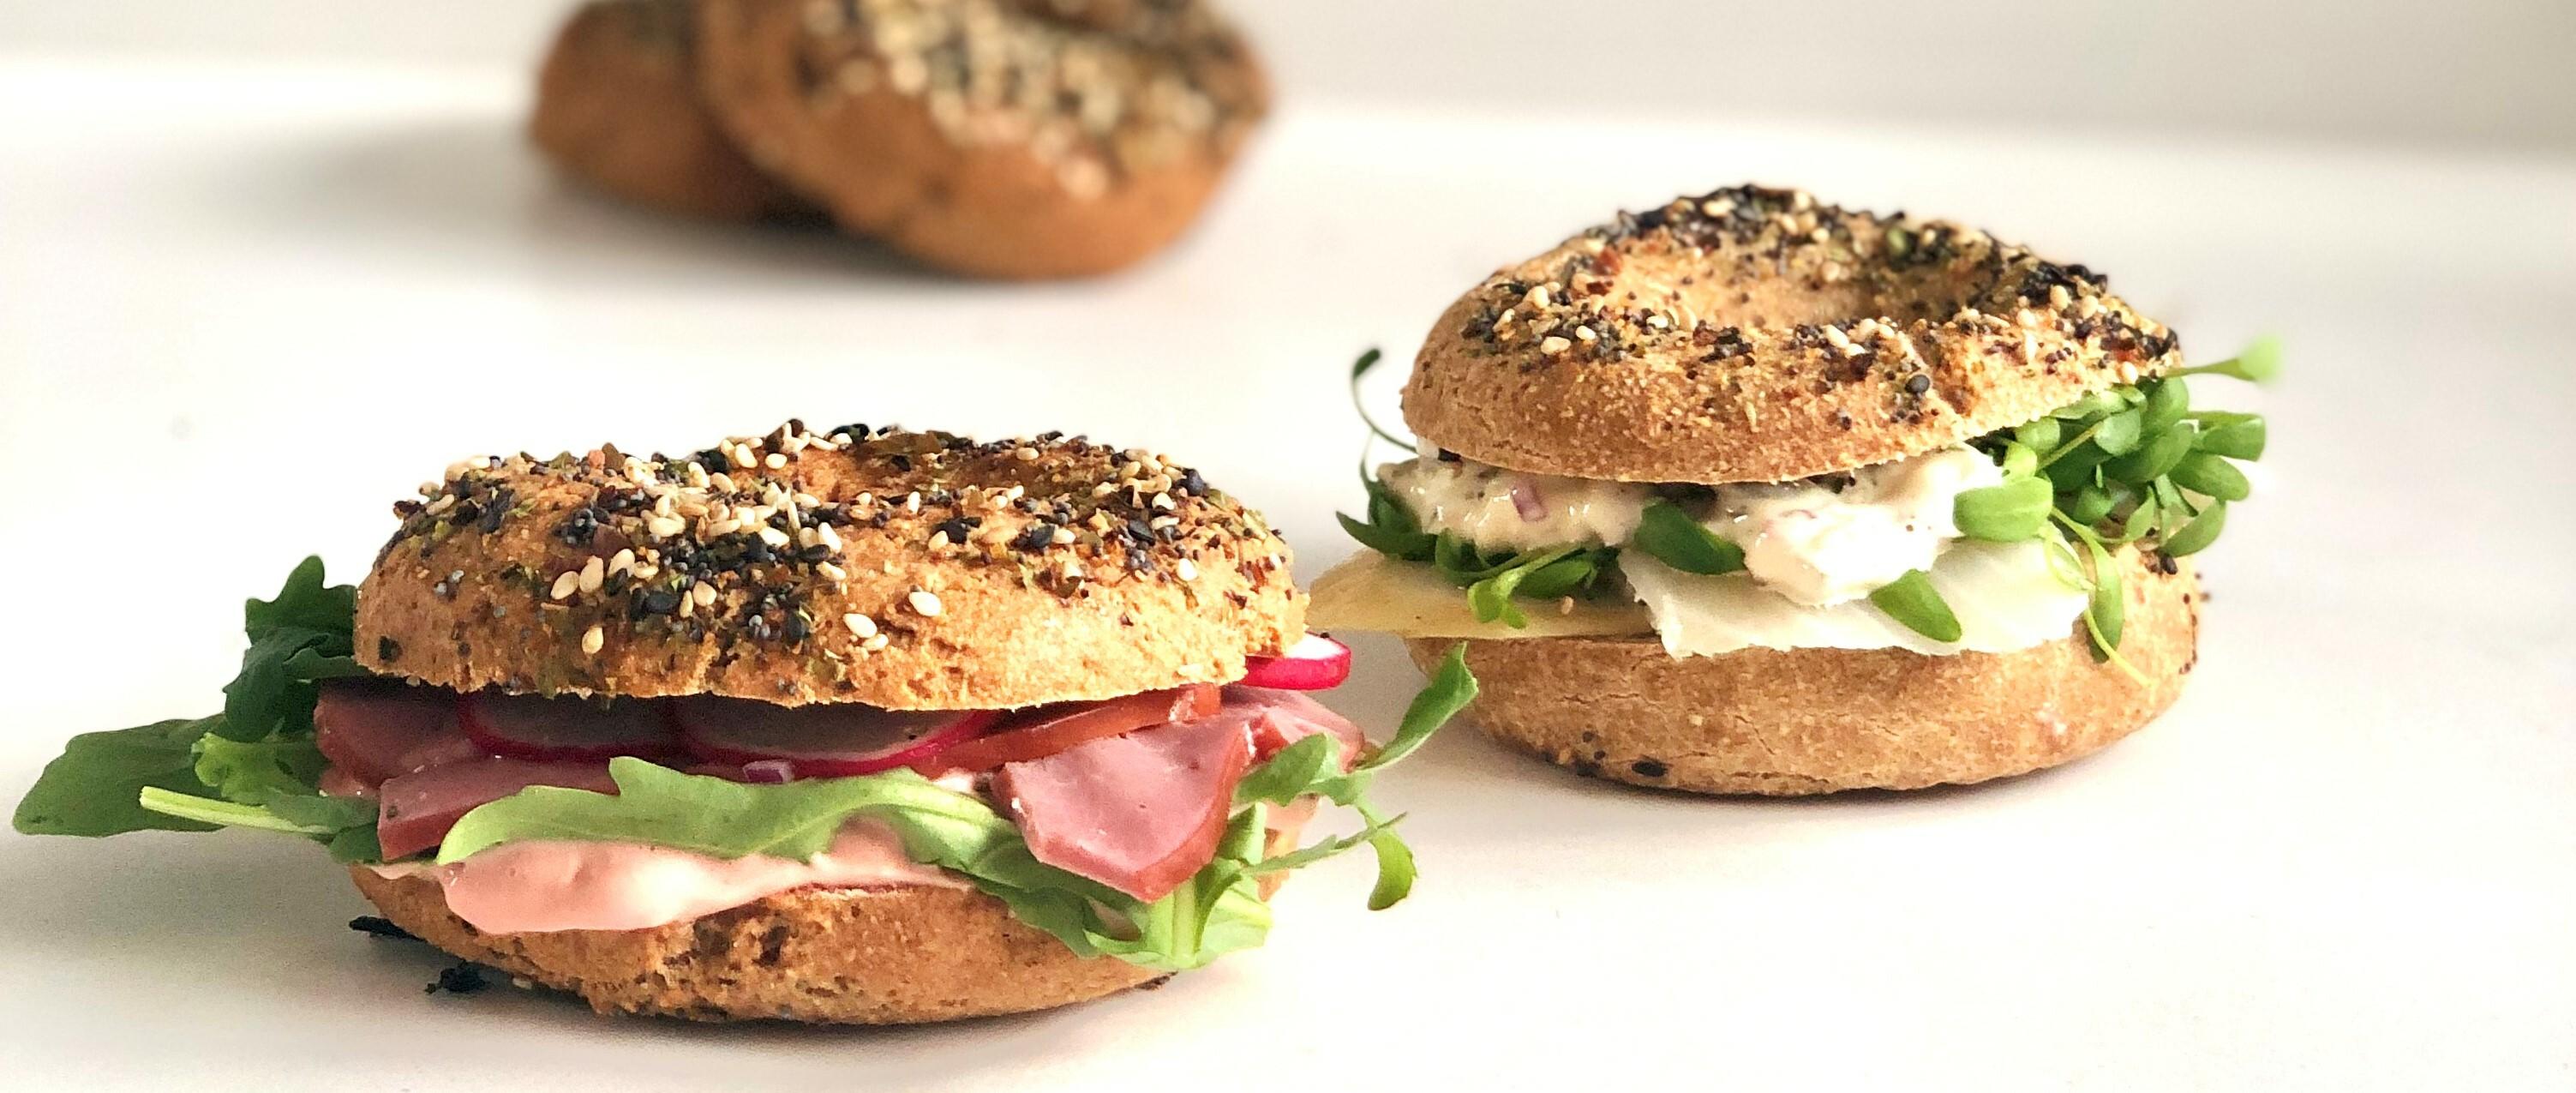 Treat bagels image